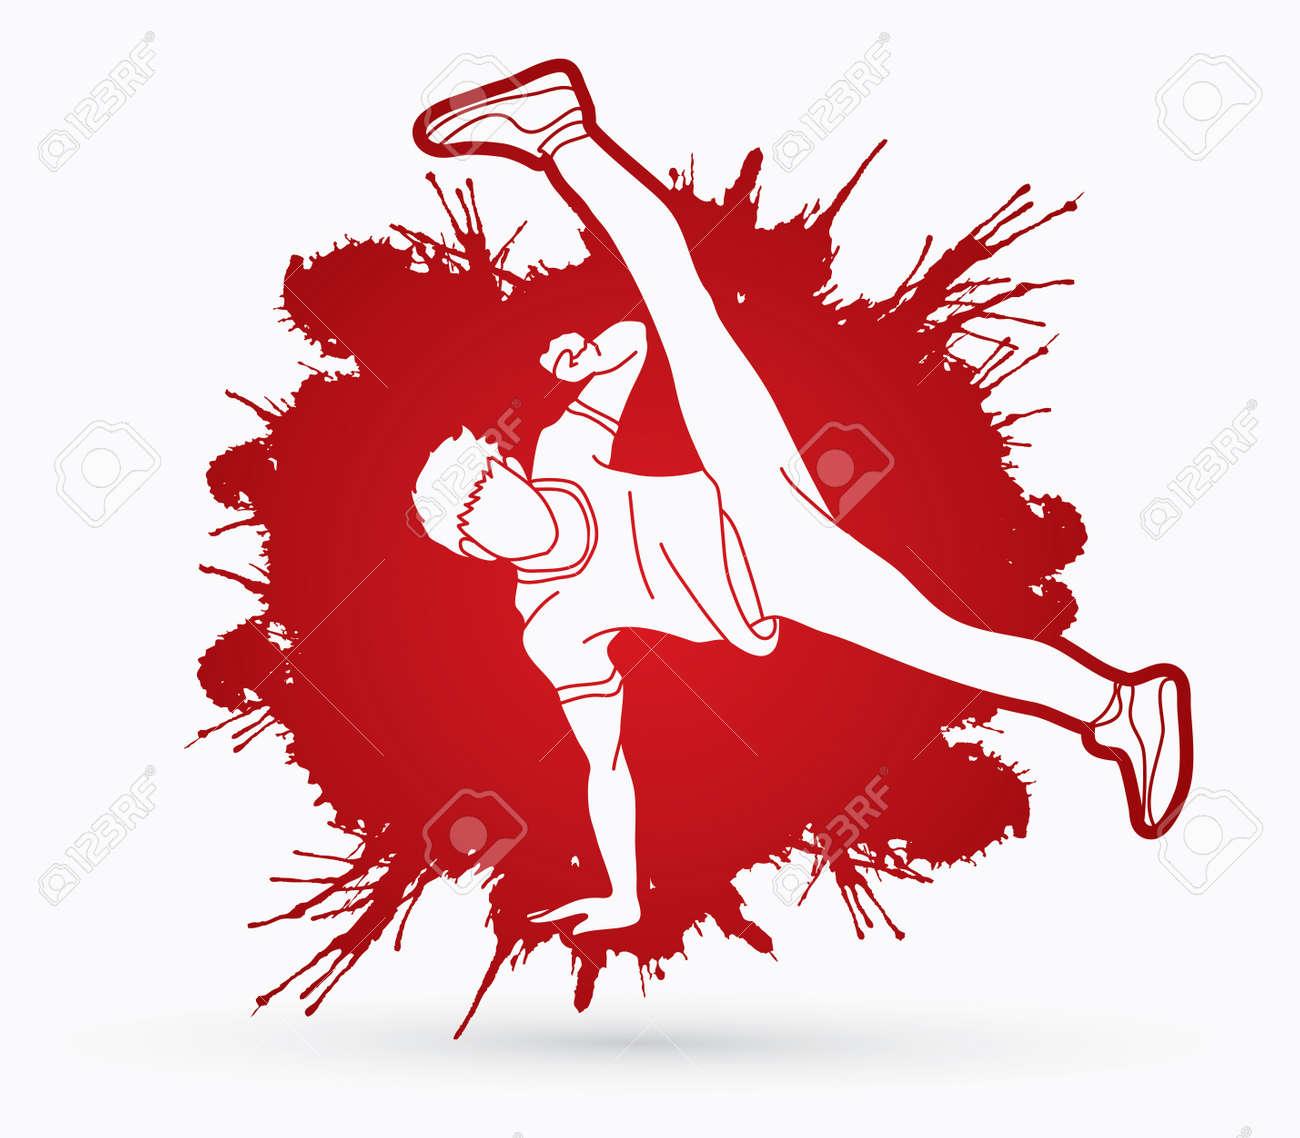 street dance b boys dance hip hop dancing action designed on